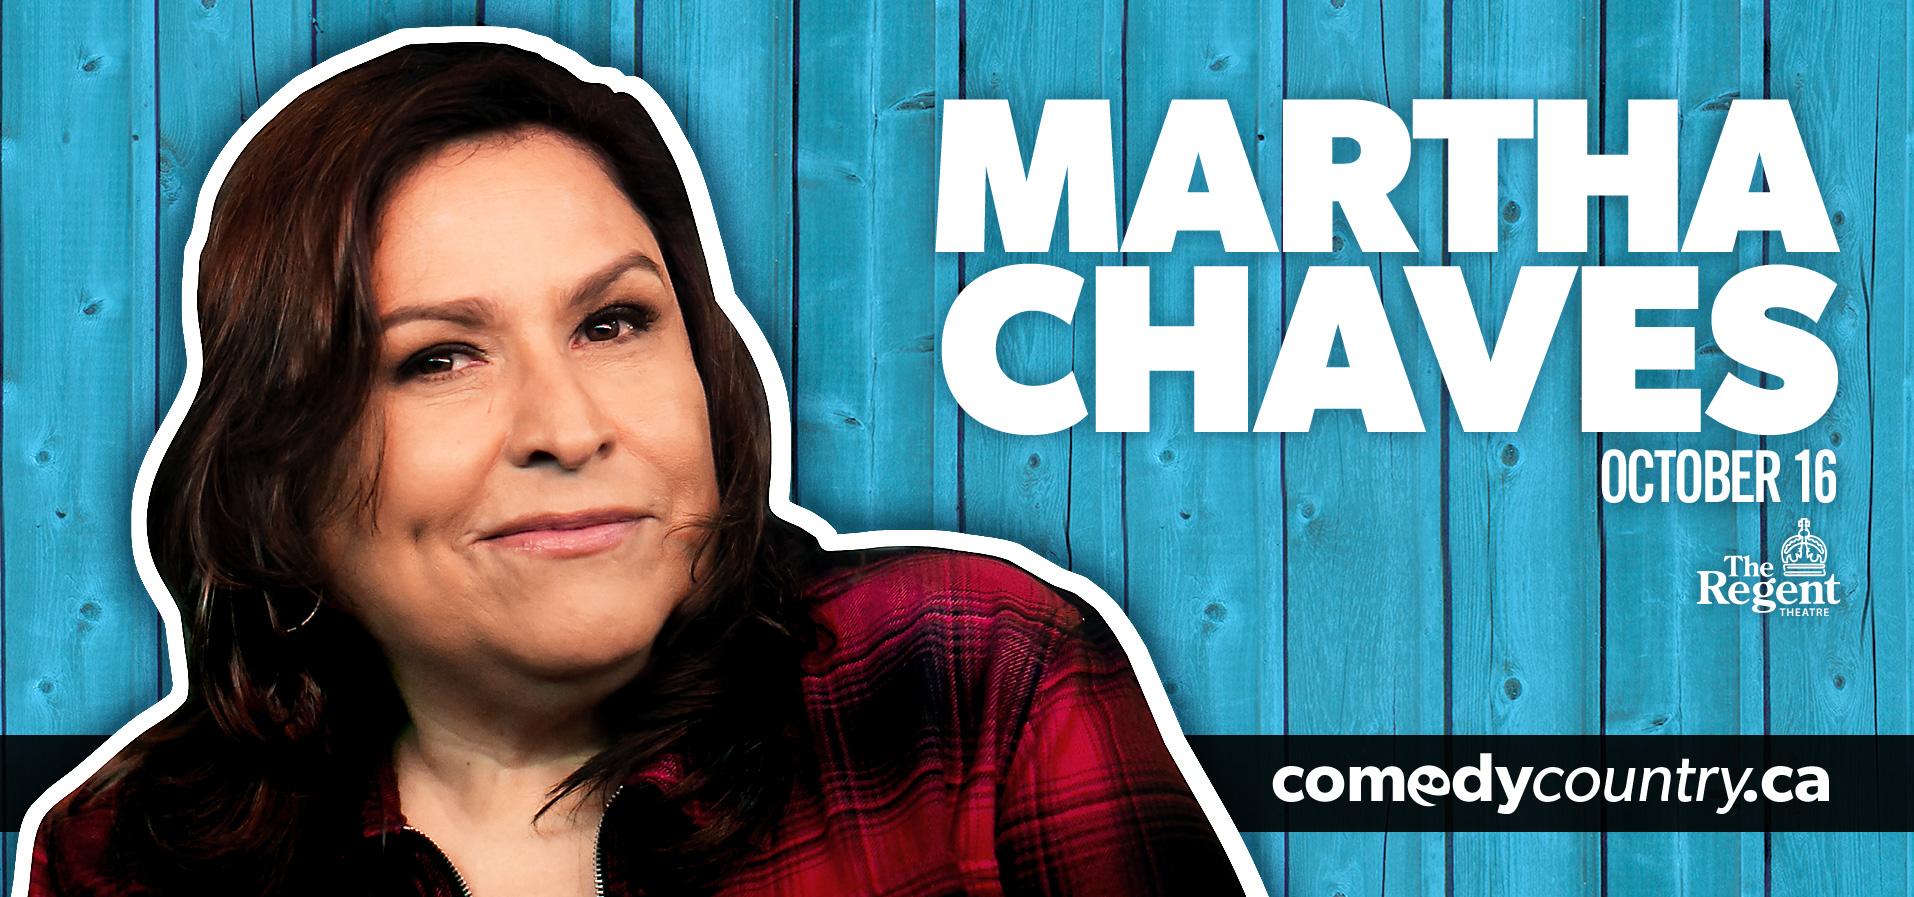 Martha Chaves